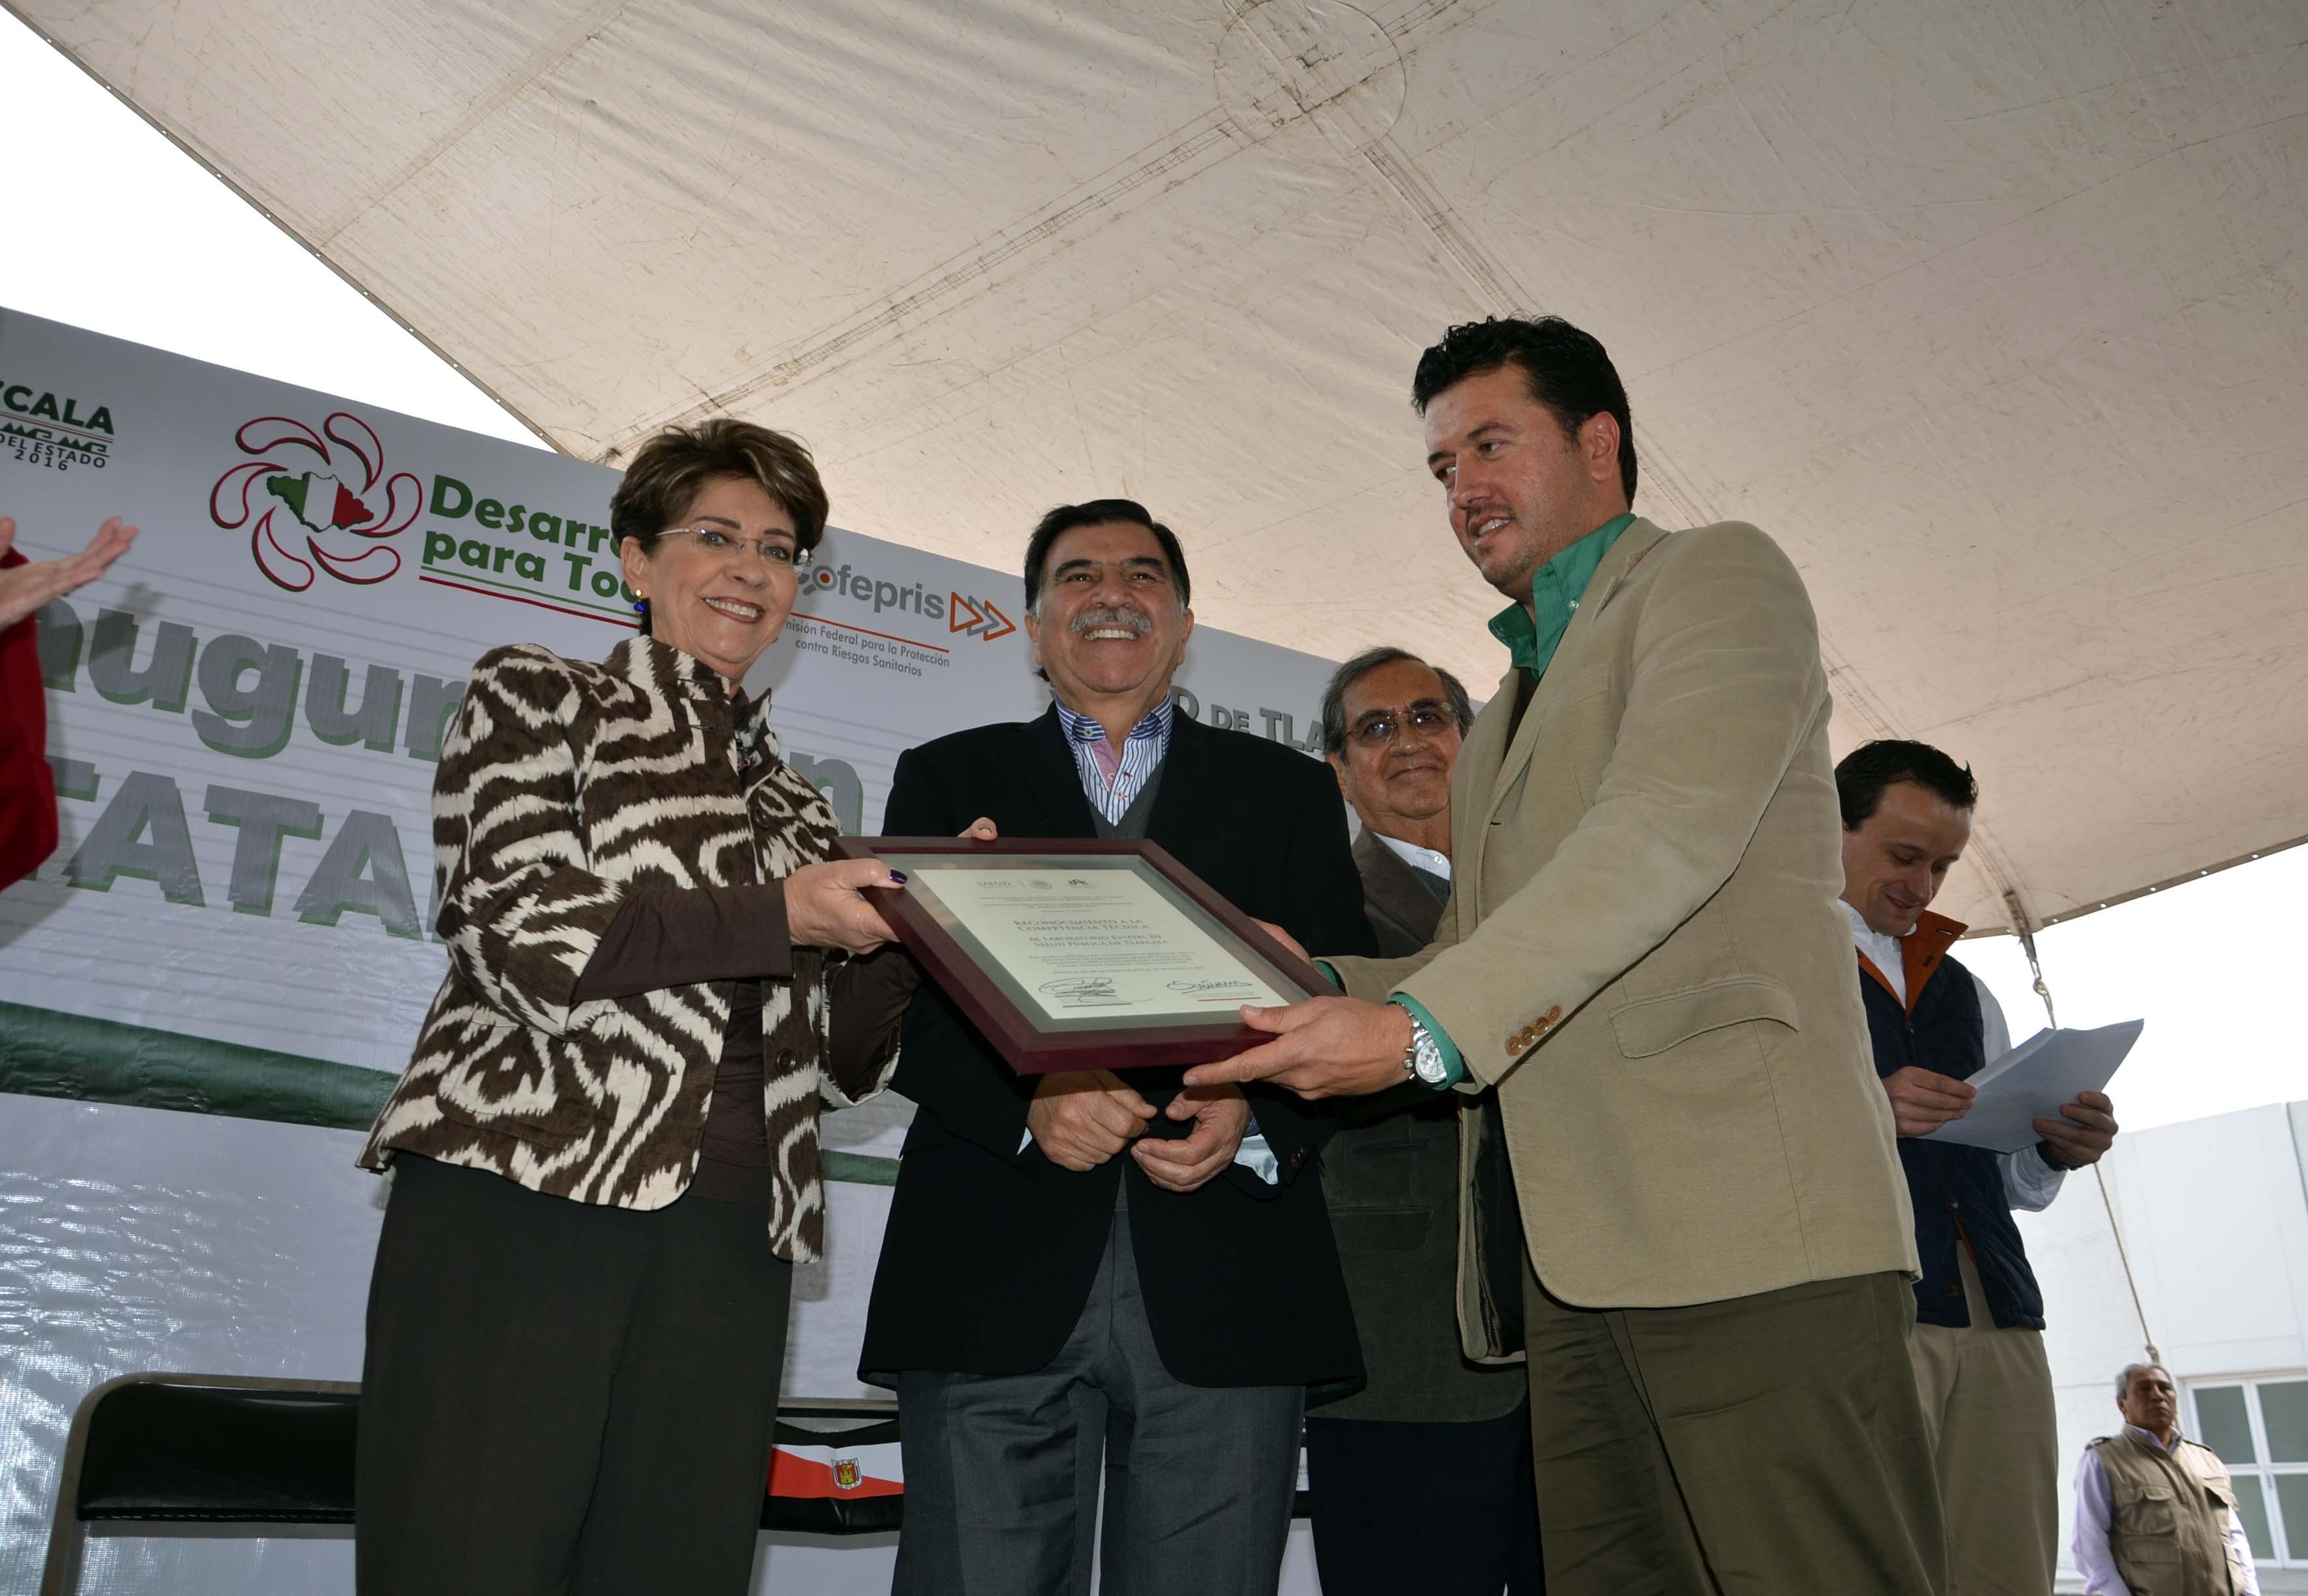 030215 Inauguraciu00F3n del Laboratorio Estatal de Salud  Publica 02jpg